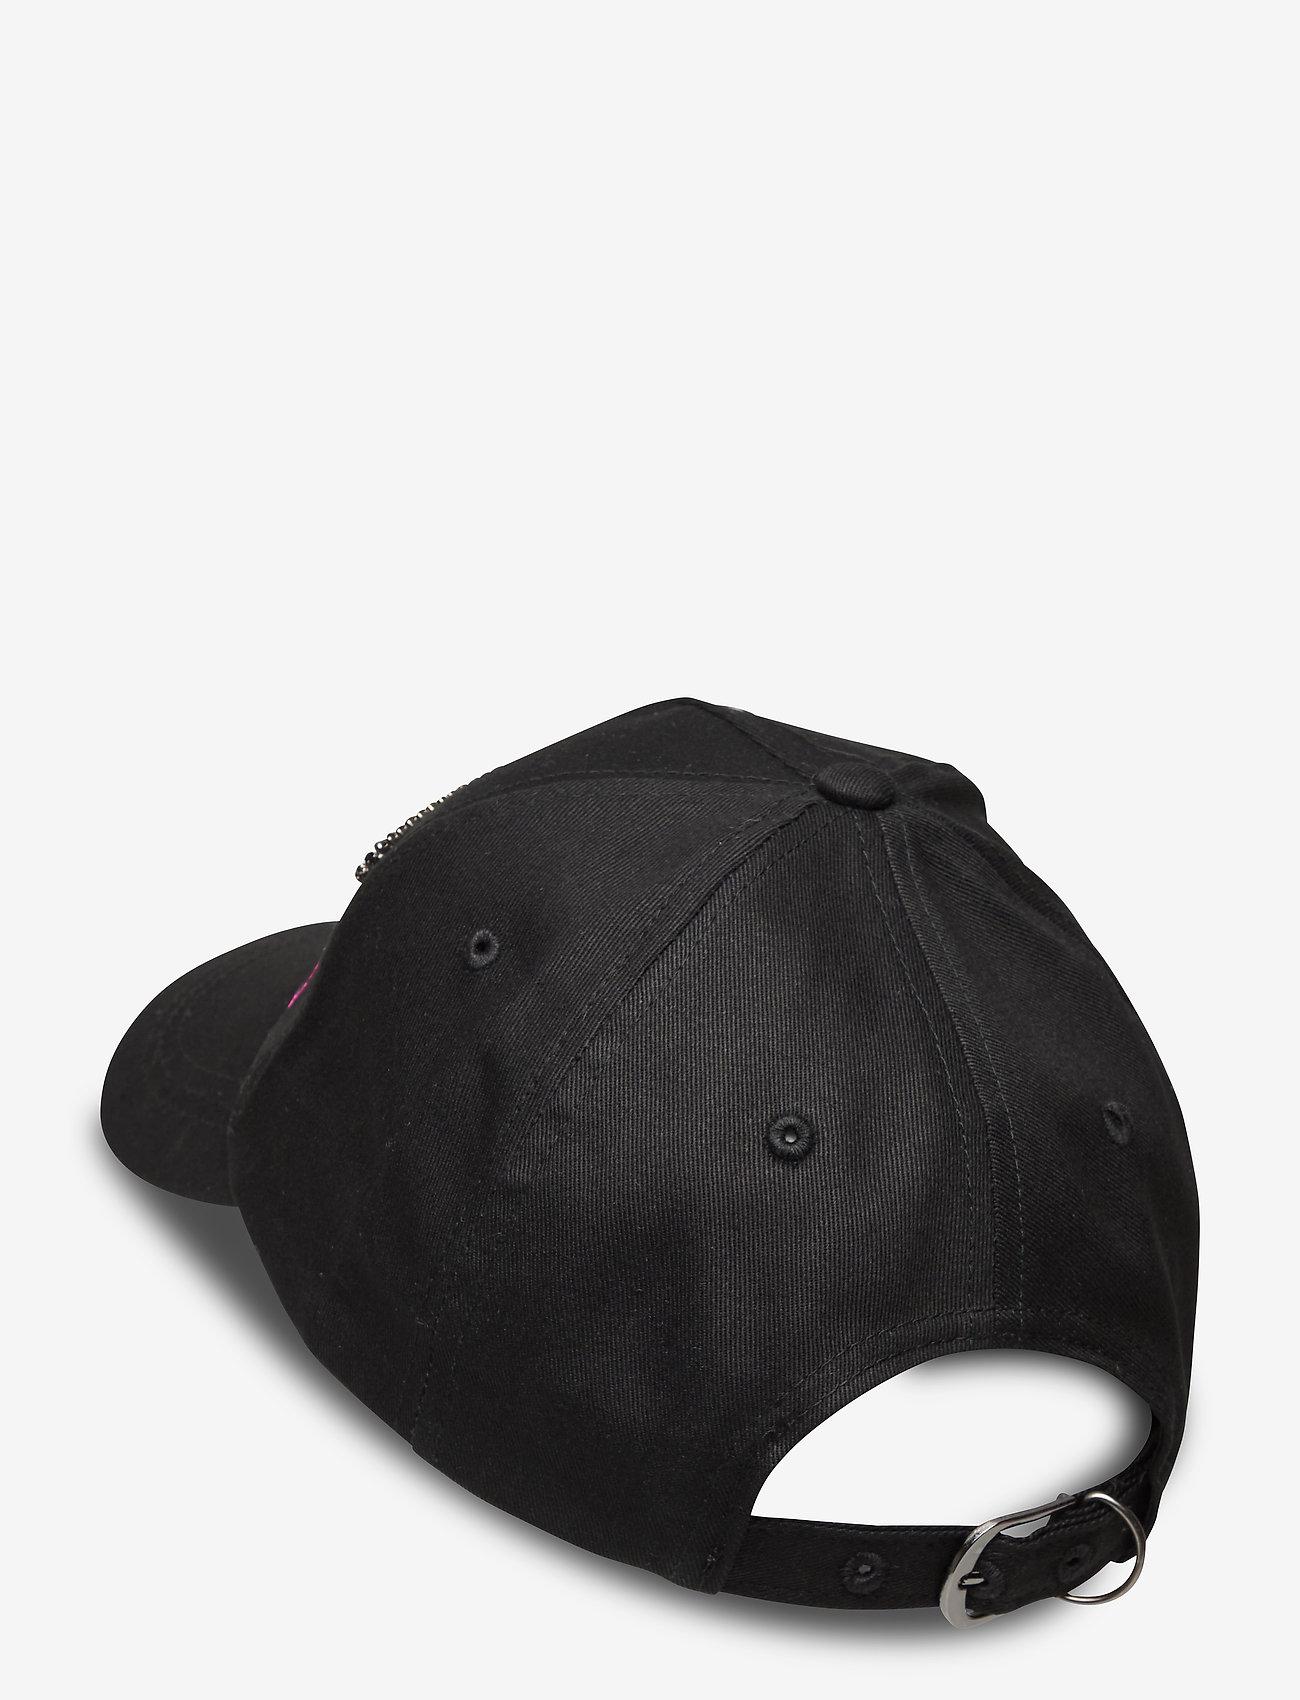 GUESS Jeans - PORTIA BRIGHT CAP - kasketter - jet black a996 - 1